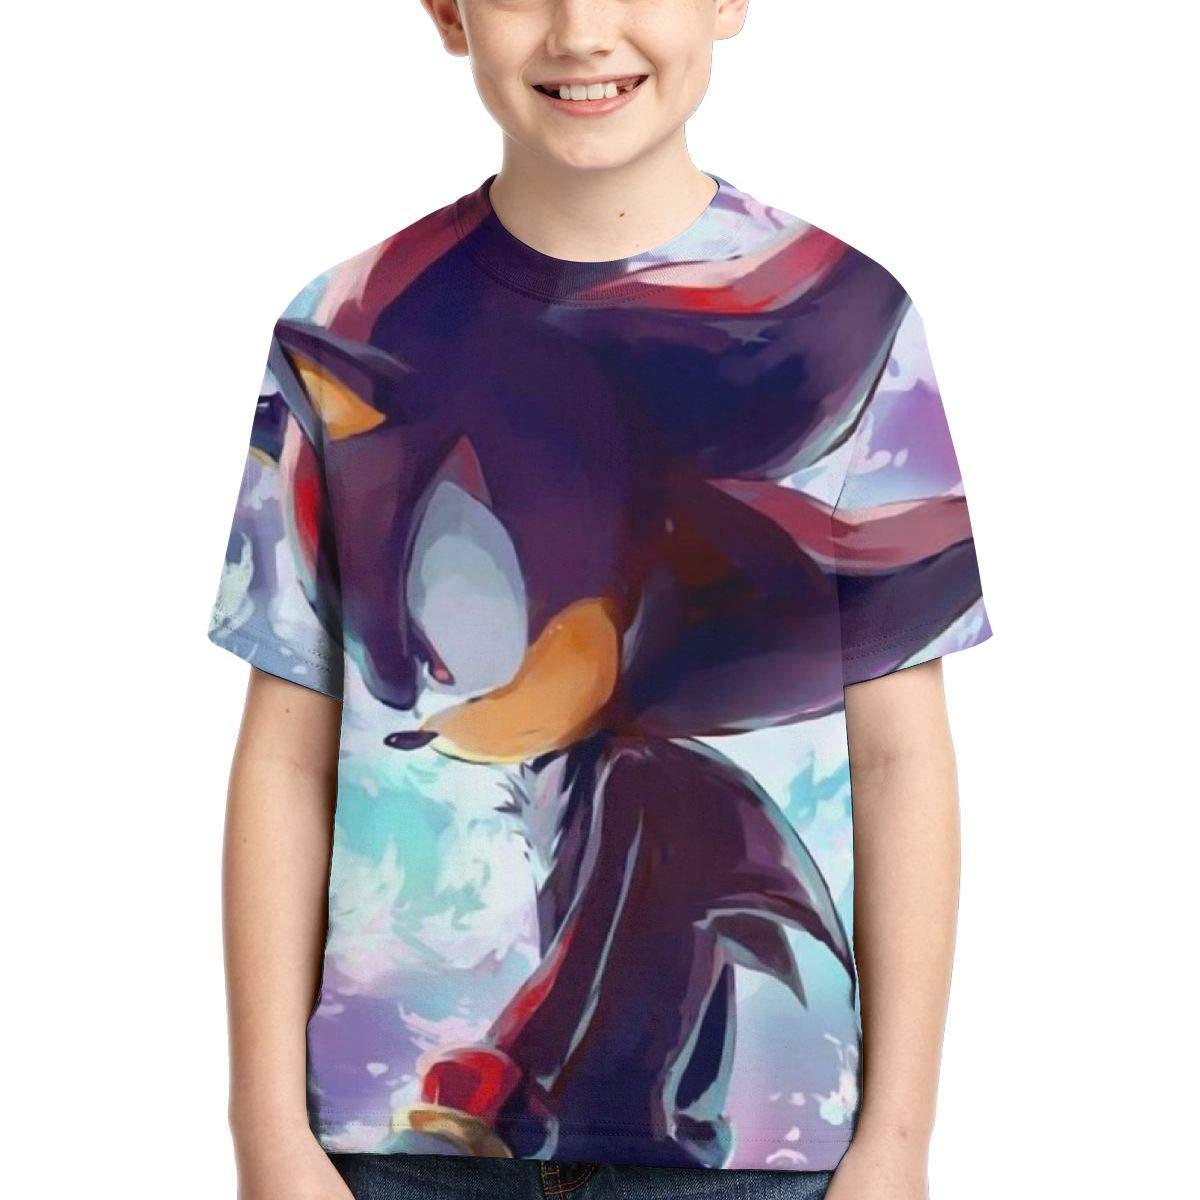 Hatstng Shadow The Hedgehog Sonic Boys Girls 3D Print Crew Tee Youth Short Sleeve T-Shirt Tanks Tops